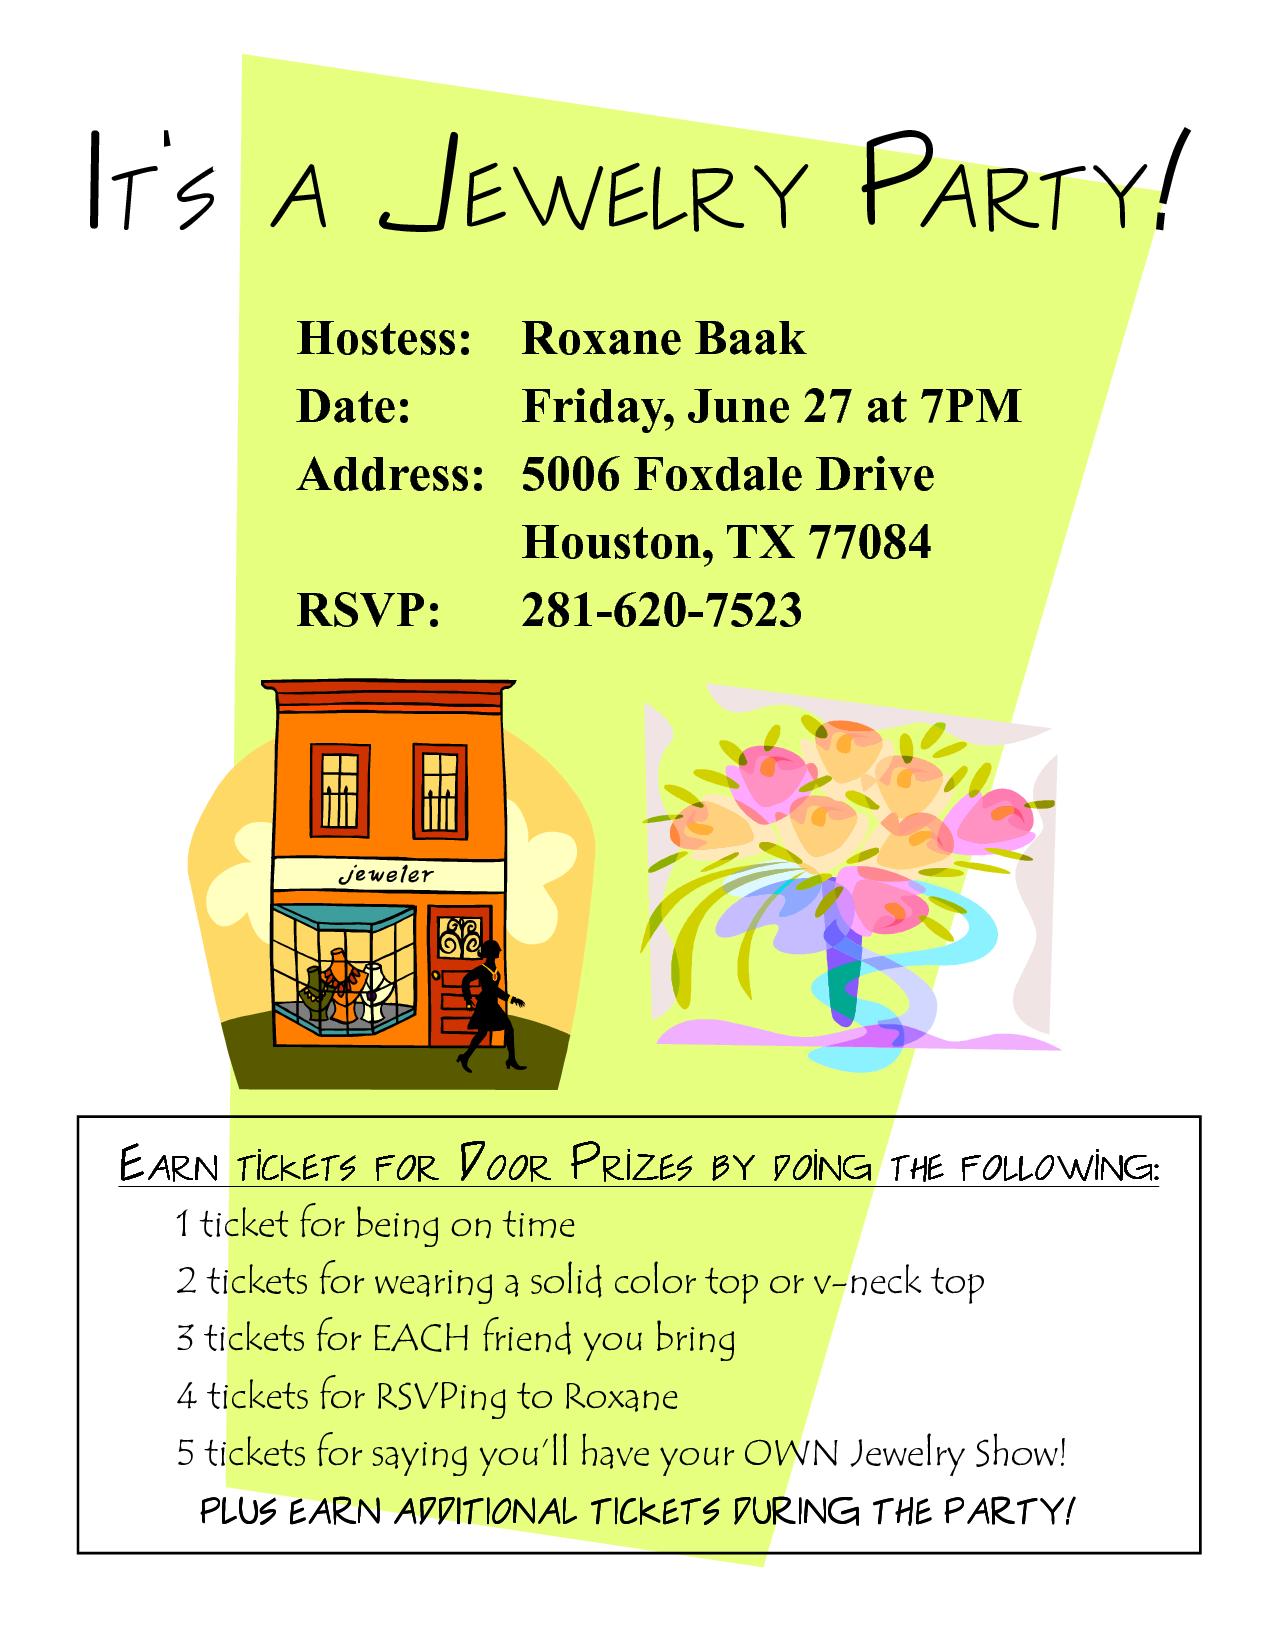 Sample Jewelry Party Invitation